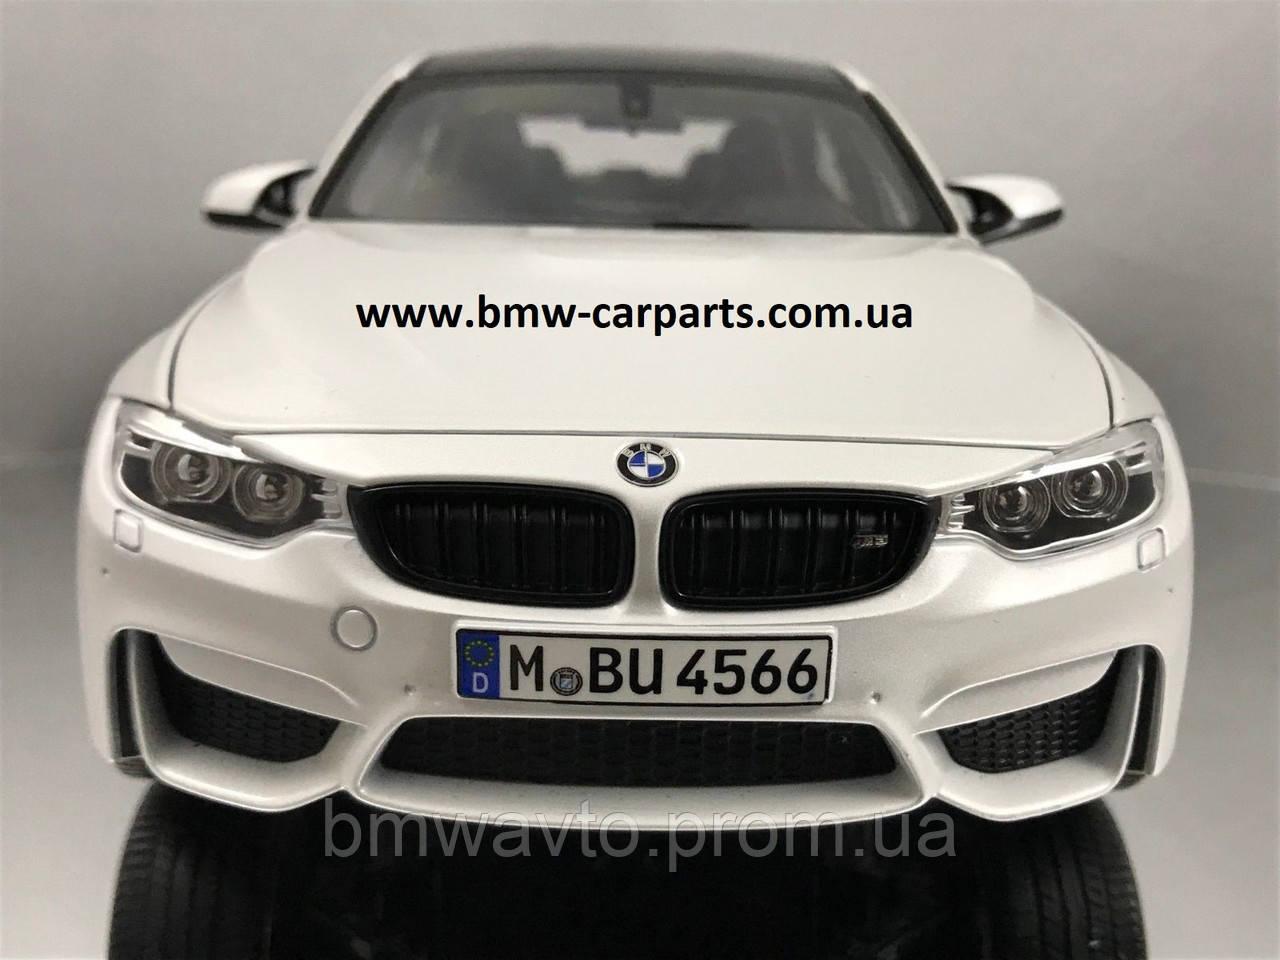 Модель автомобиля BMW M3 Competition (F80), Scale 1:18, Mineral White Metallic